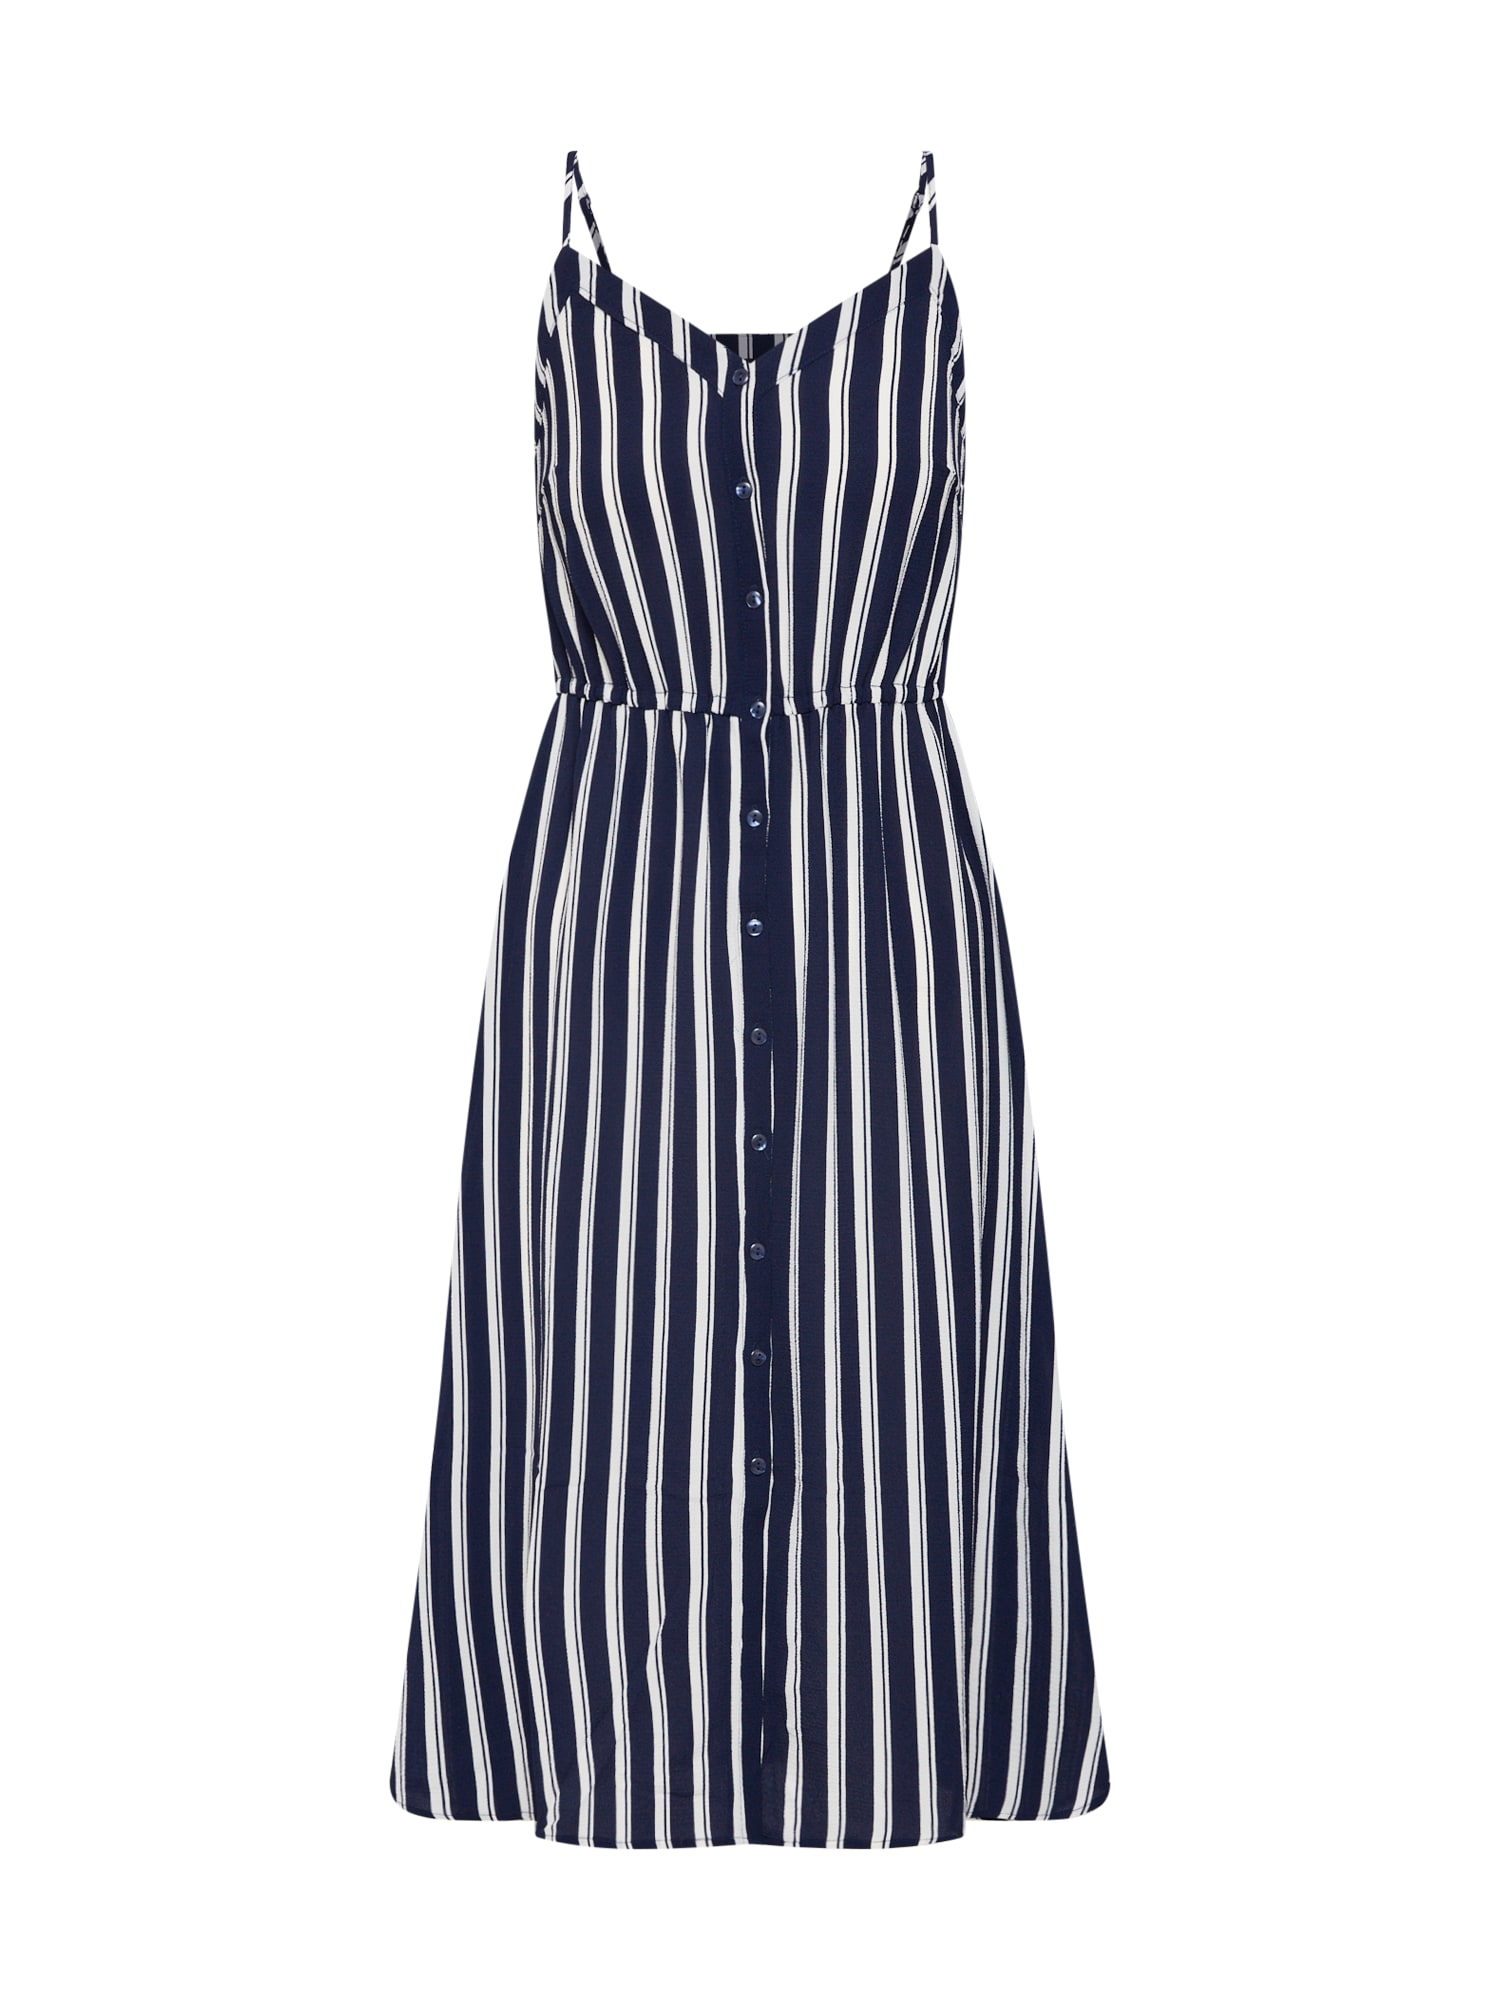 Letní šaty VMSASHA námořnická modř bílá VERO MODA